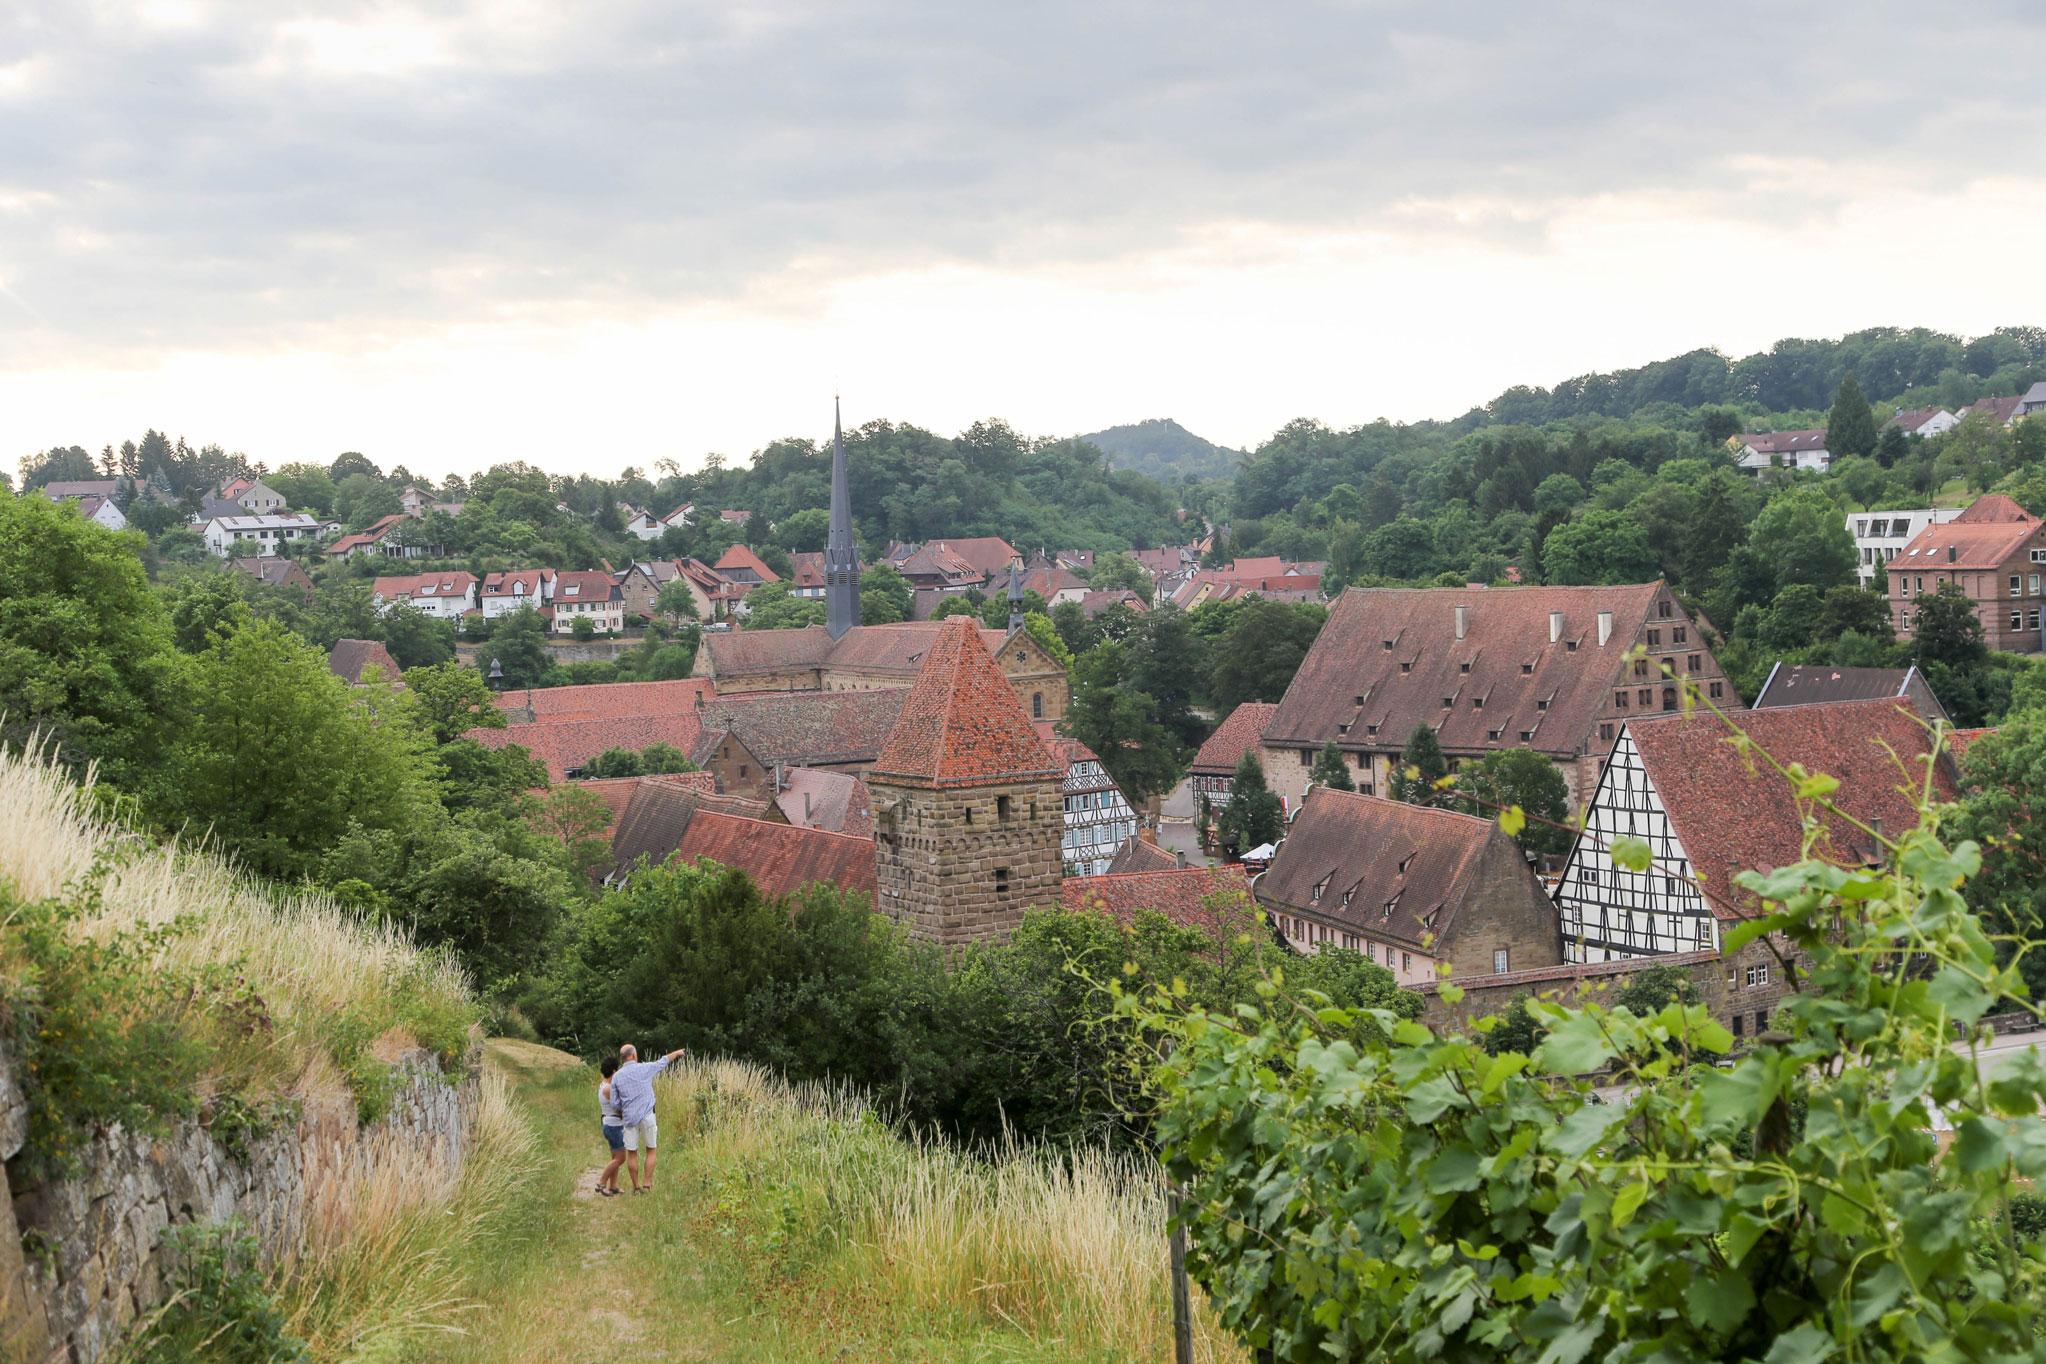 Blick auf das Kloster Maulbronn © Conny Plank